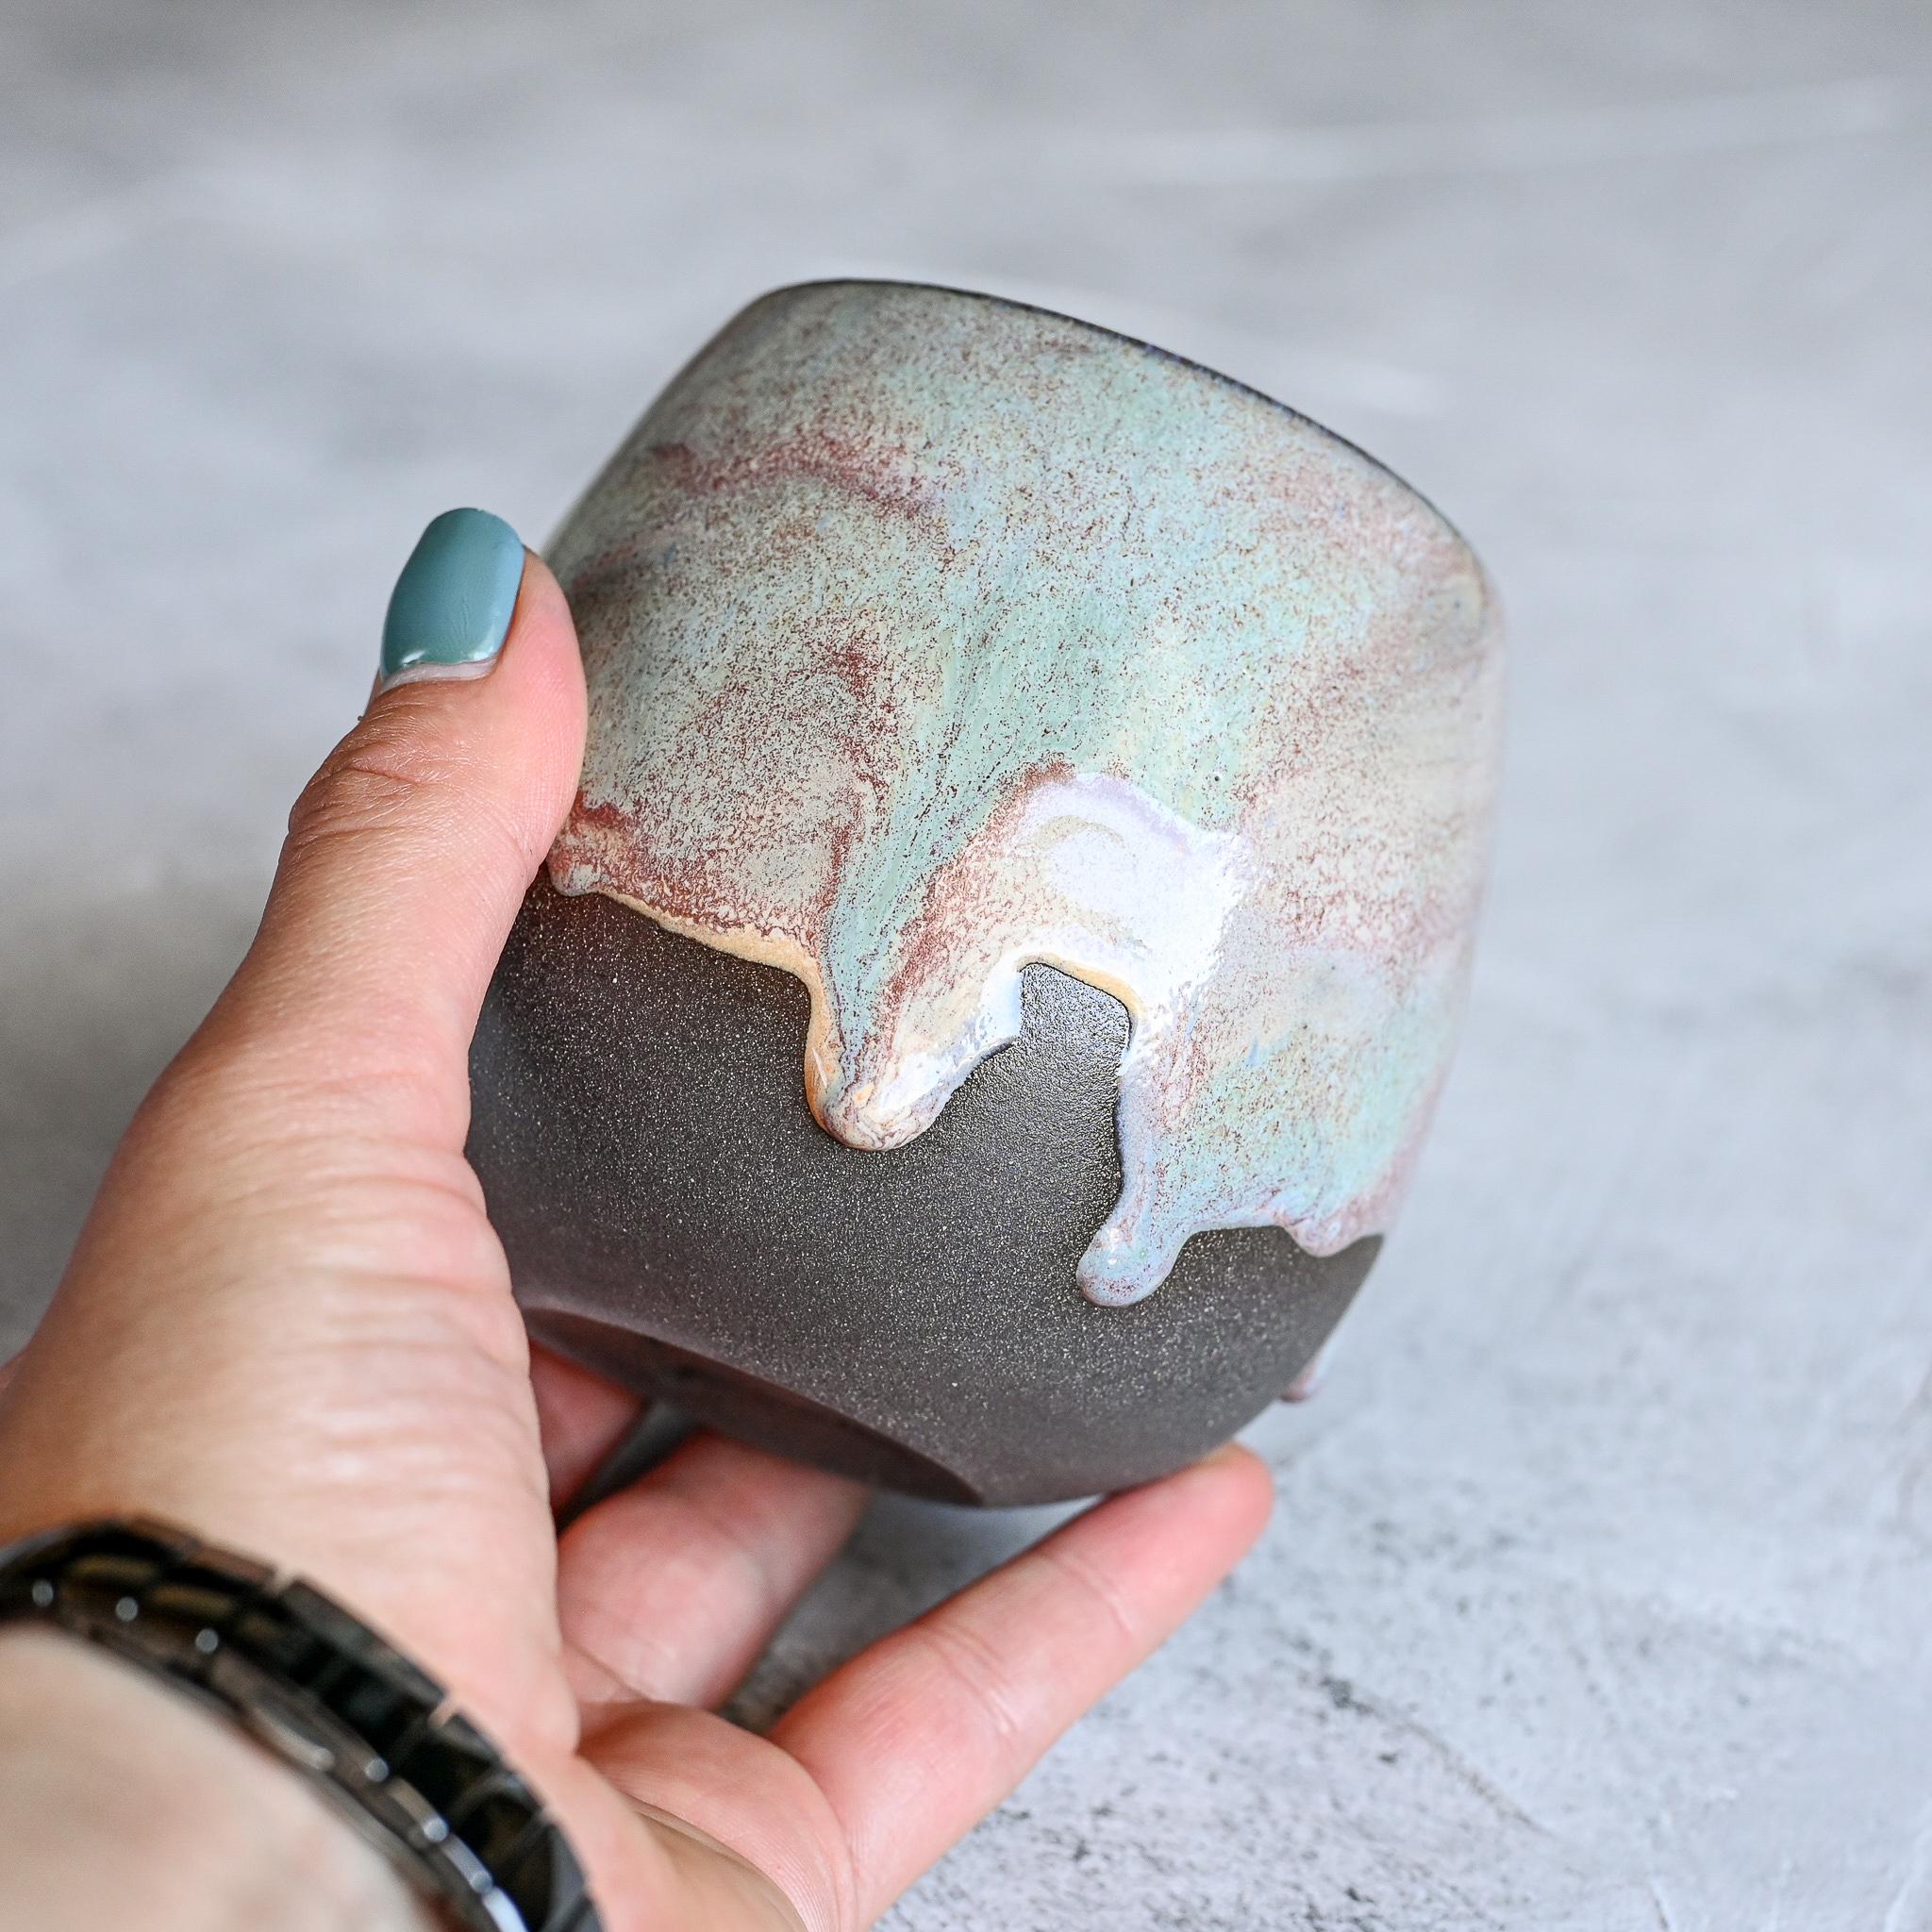 картинка Керамический стакан Марии Левиной 19 - DishWishes.Ru